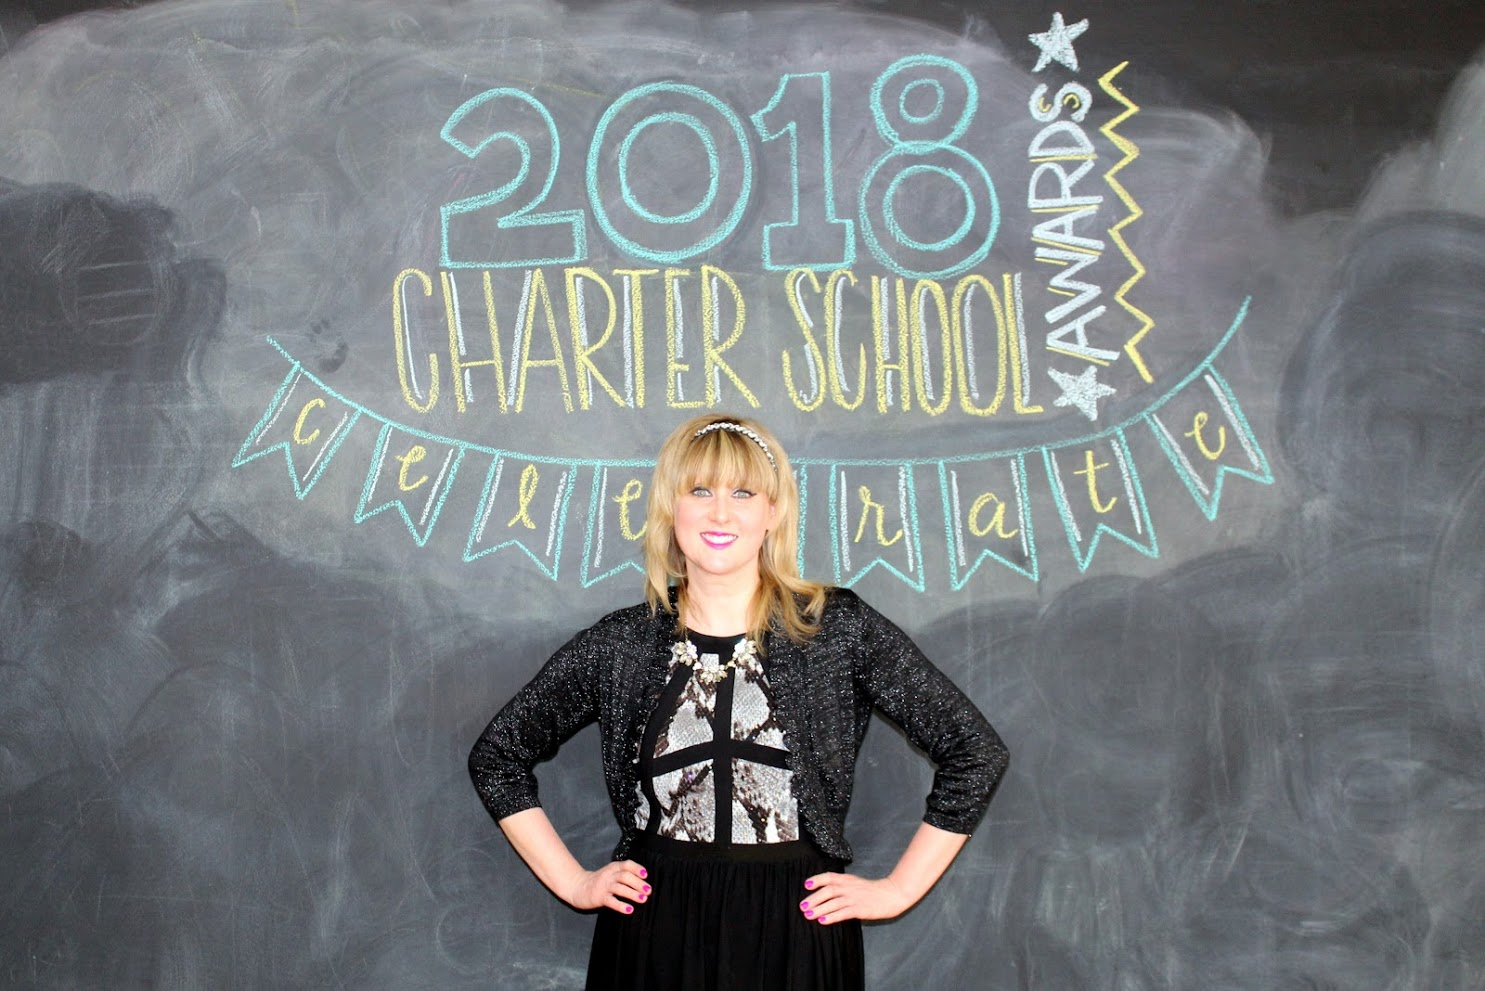 A photo of Kristina Price, 2018 Charter School Teacher of the Year winner.